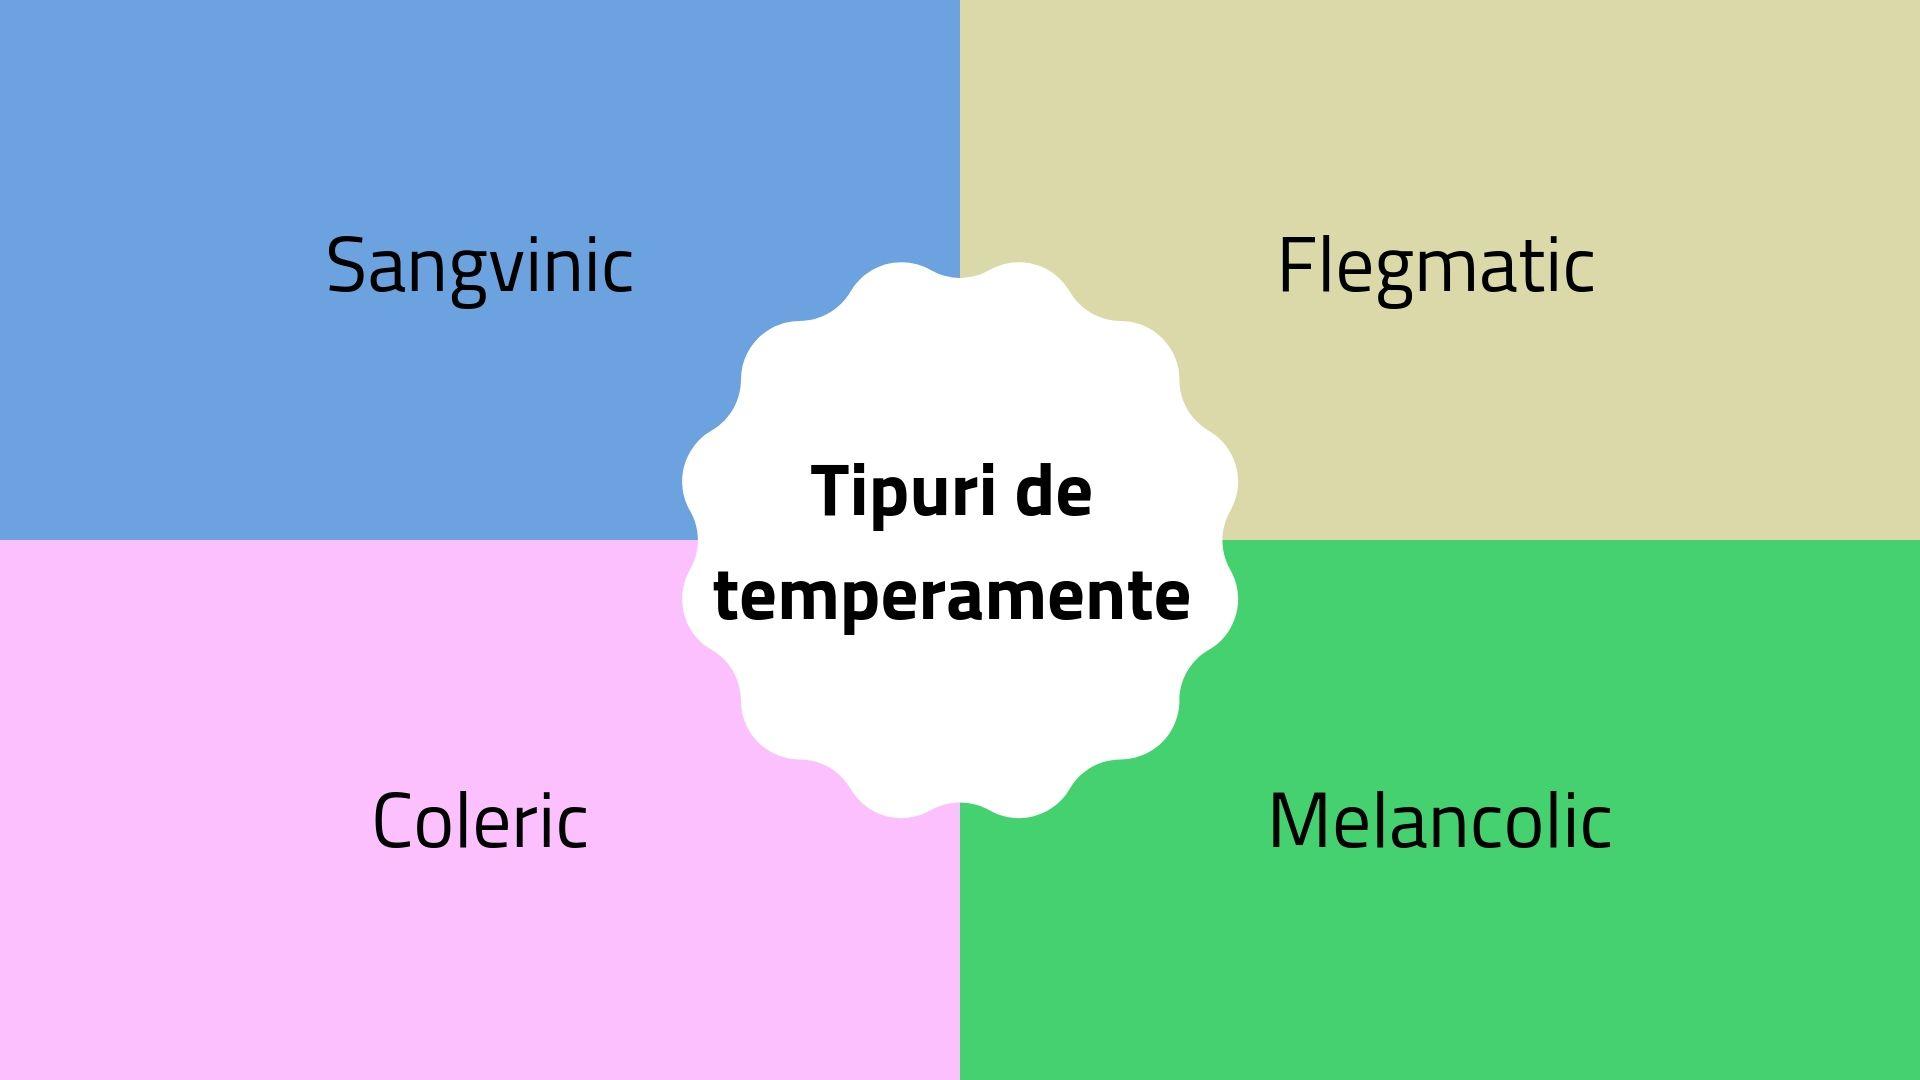 Tipuri de temperamente